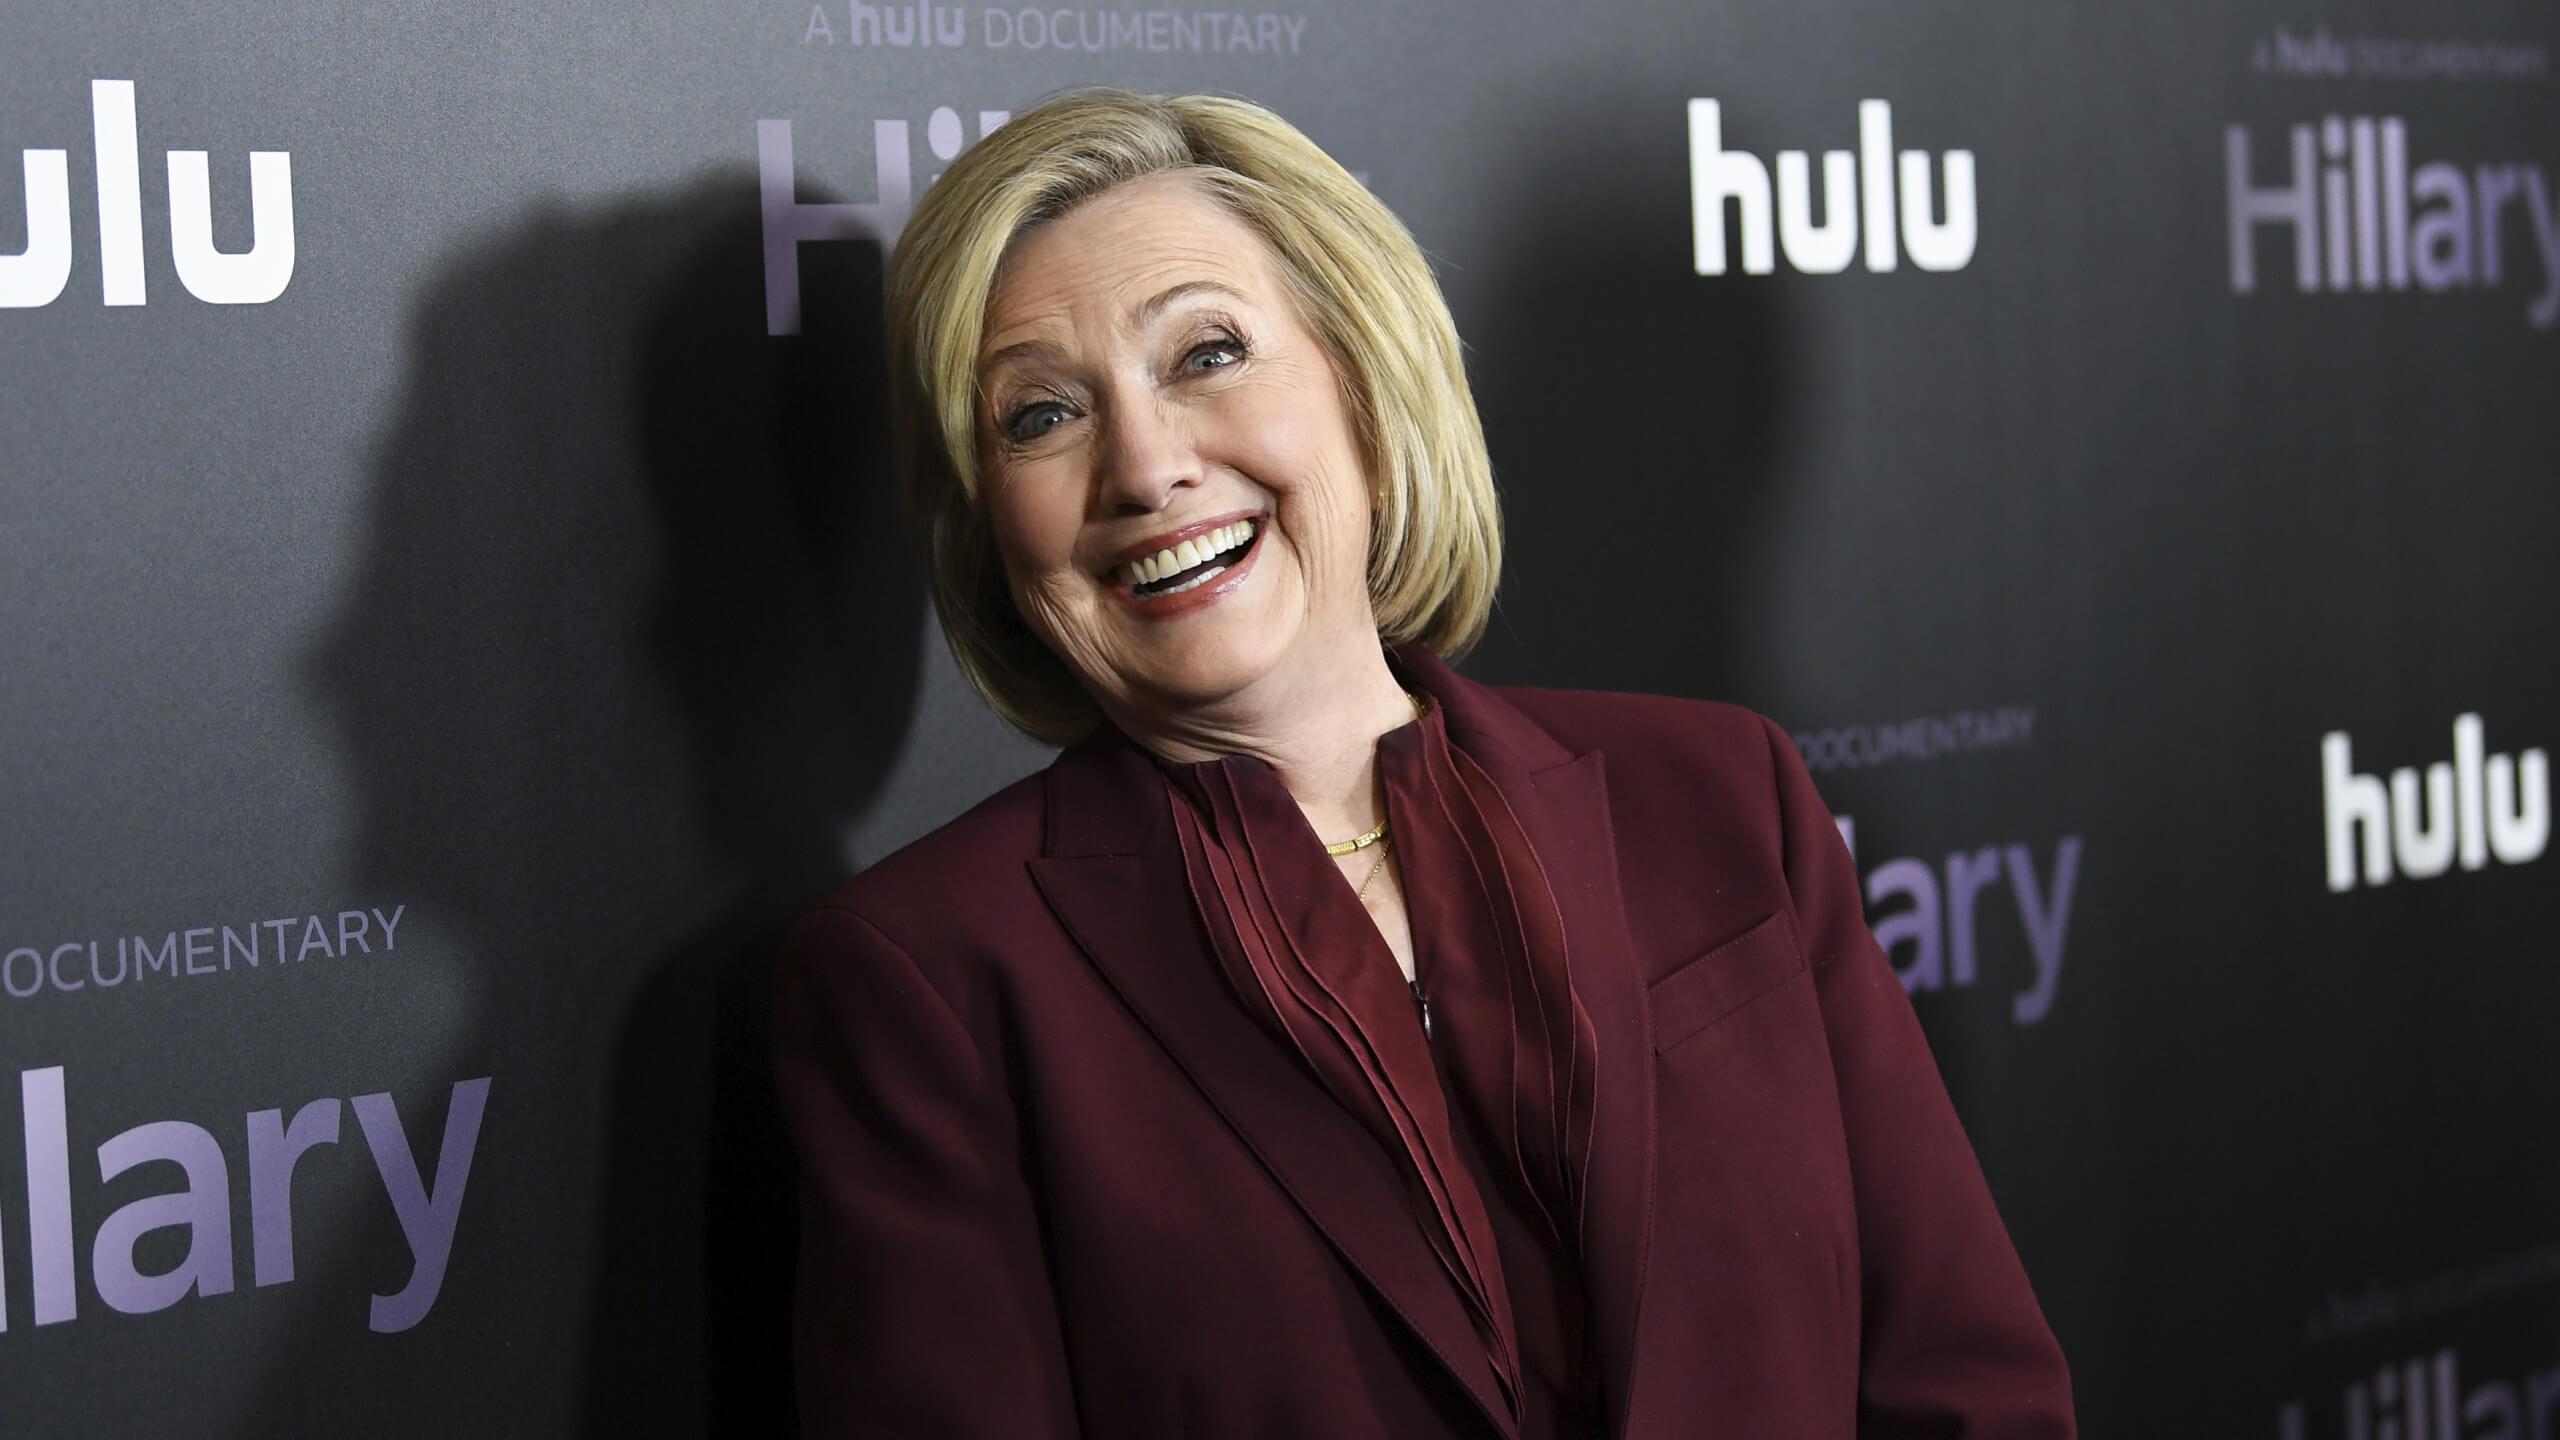 Nein, Hillary Clinton wurde nicht in Guantanamo hingerichtet